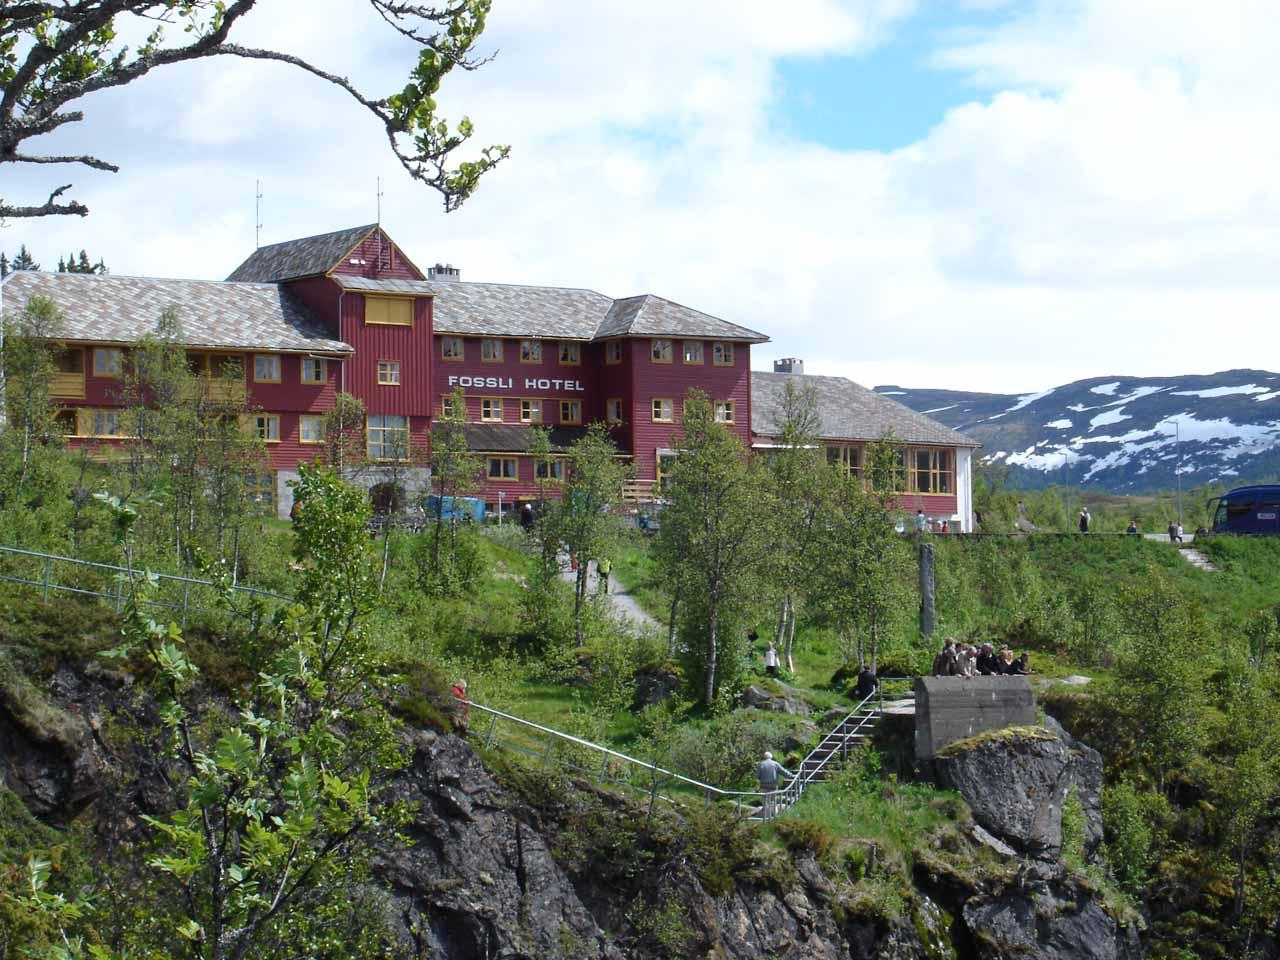 Looking back towards the Fossli Hotel